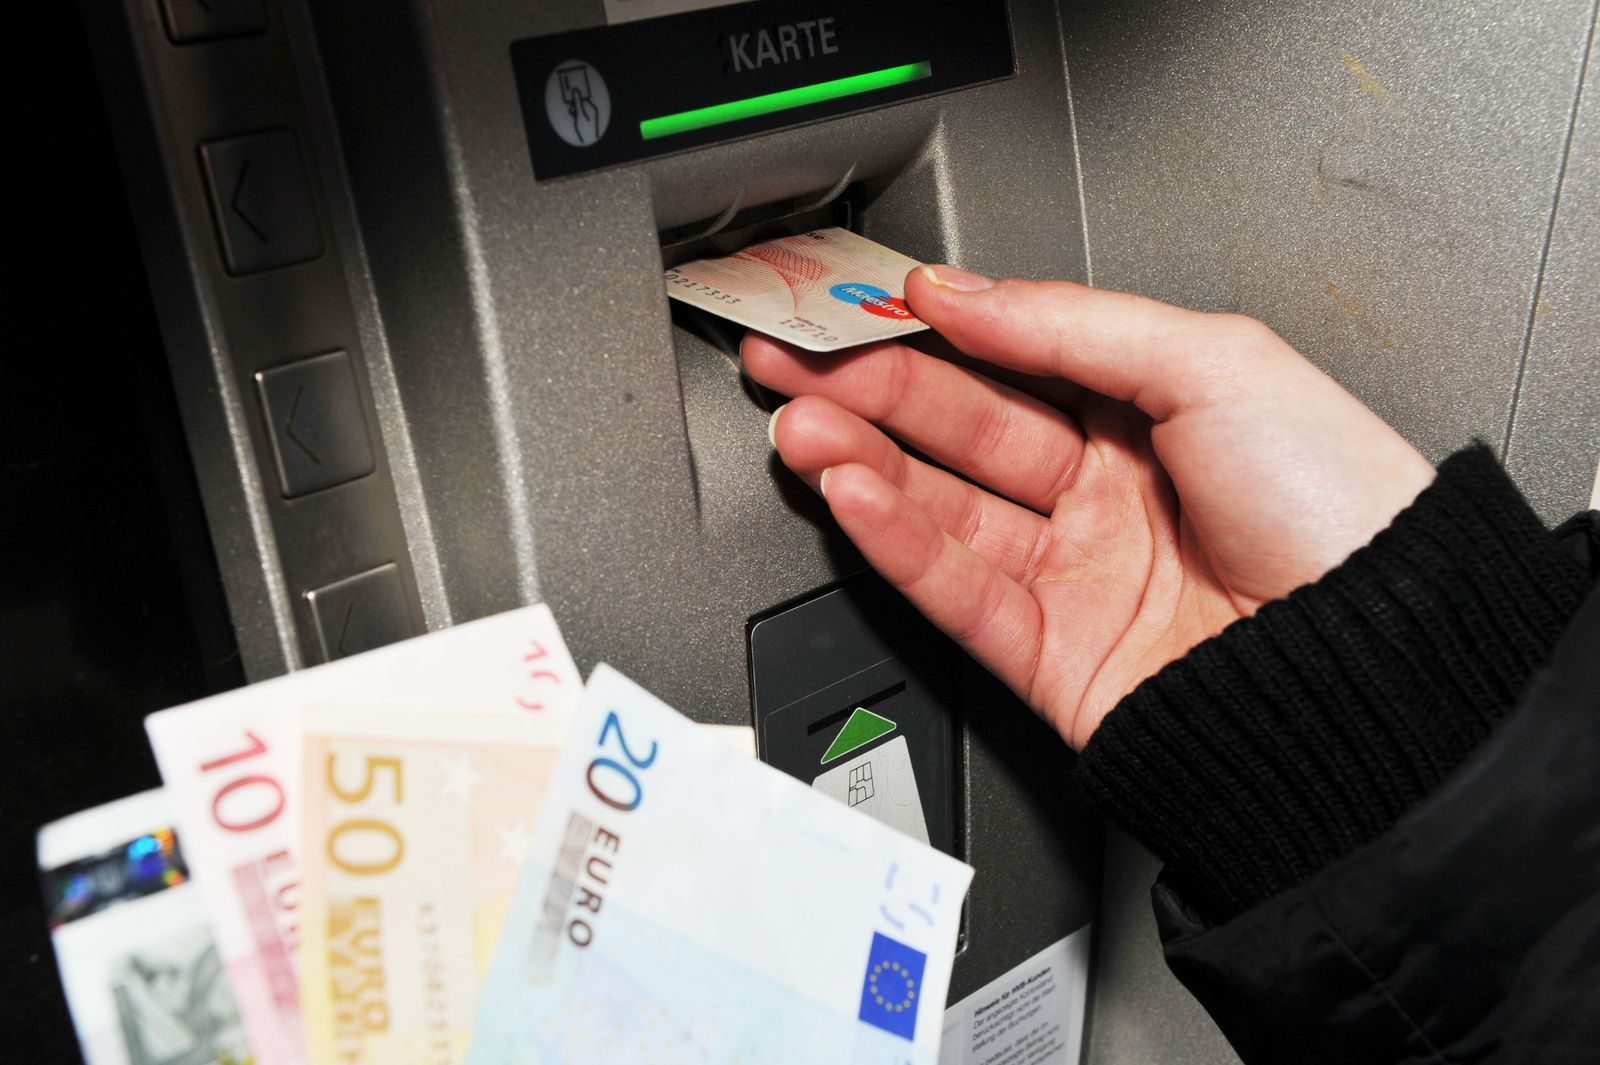 Bargeld / EC-Karte / Geldautomaten / Bank / Sparkasse / Girokonto